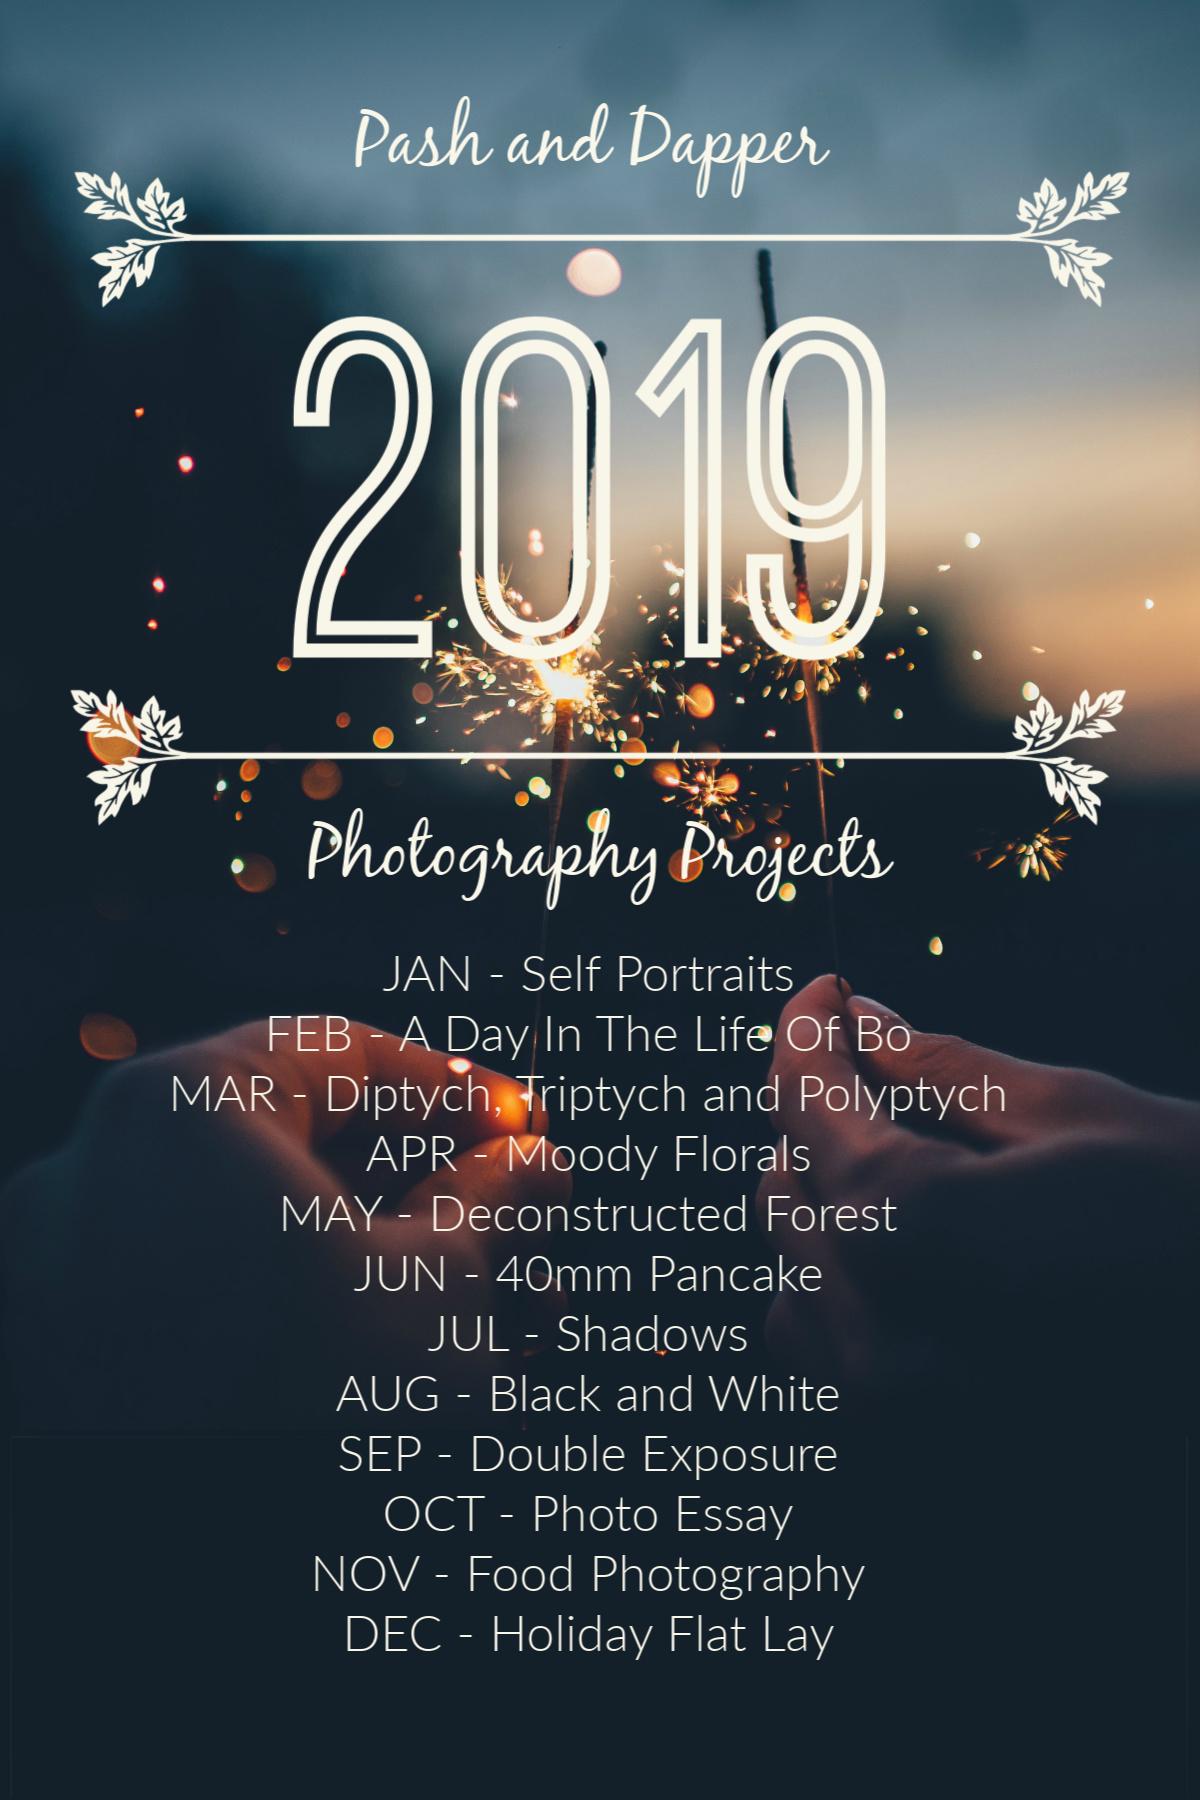 PnD Photo Projects.jpg